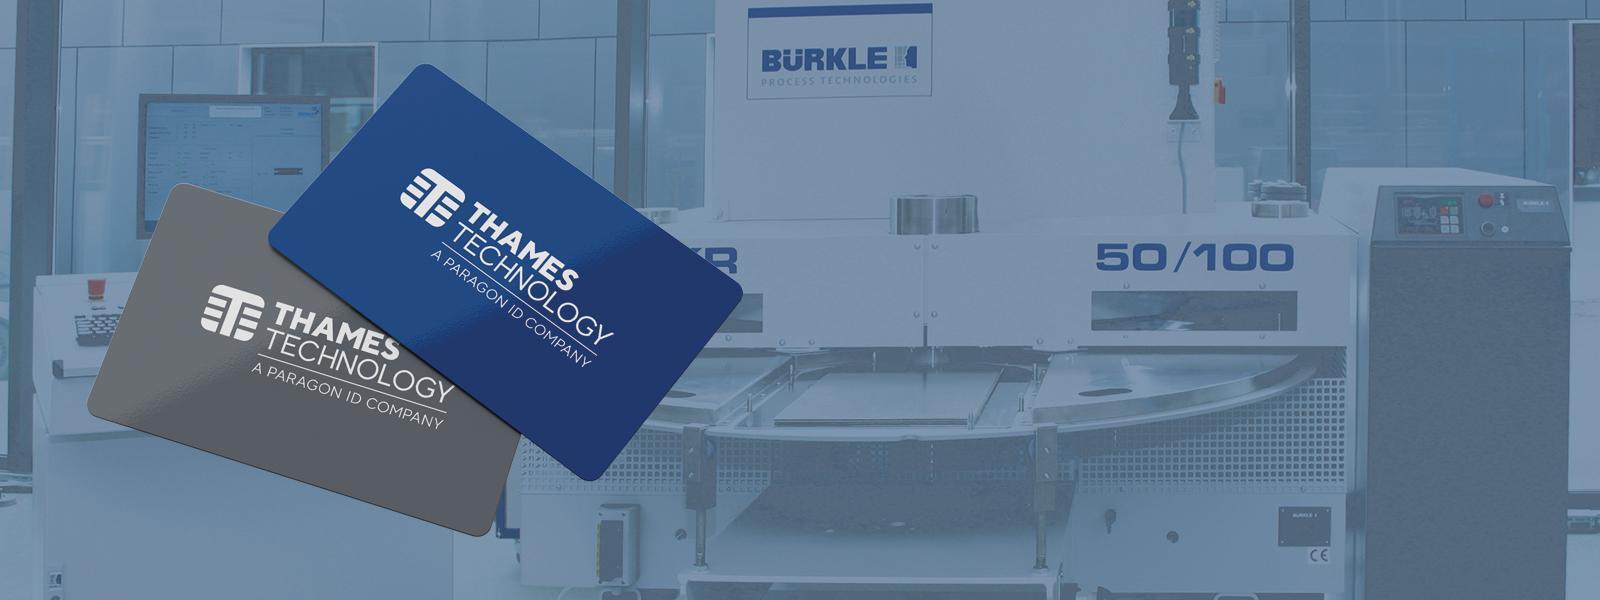 Buerkle laminator increasing production capacity at Thames Technology